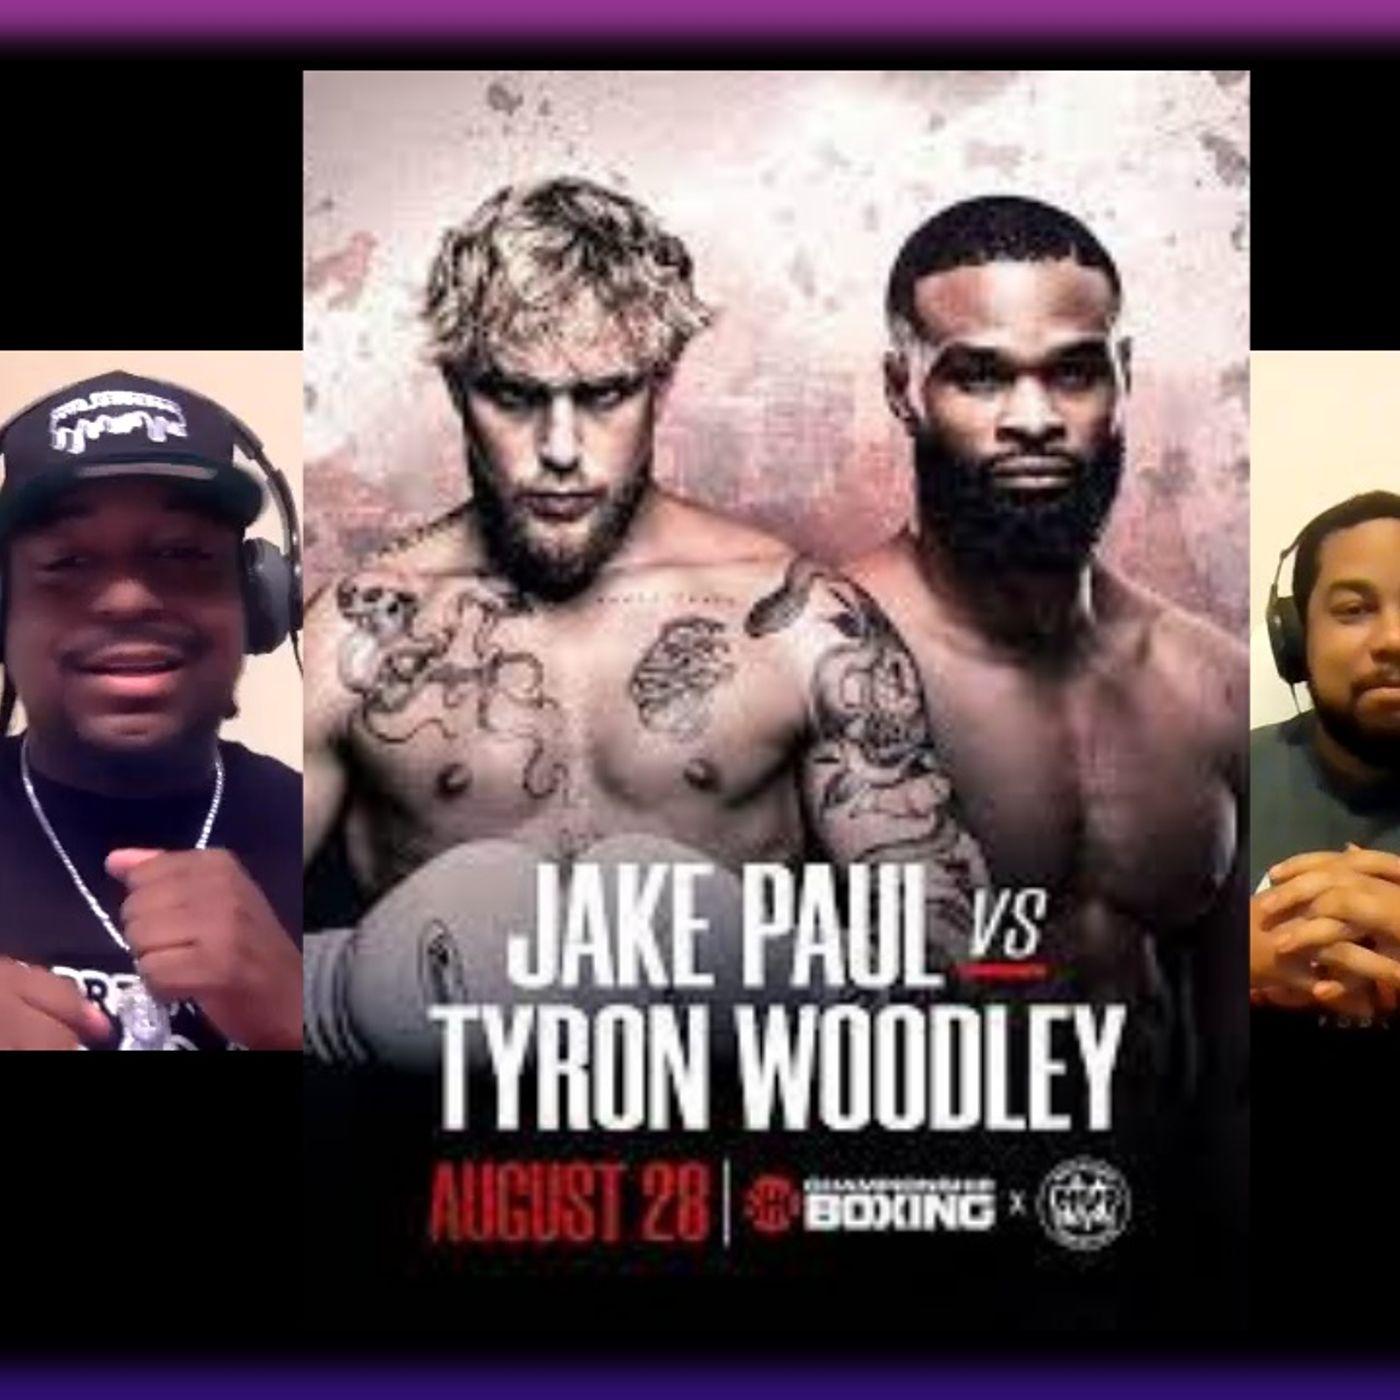 Jake Paul Vs Tyron Woodly / Evander Kane Scandal